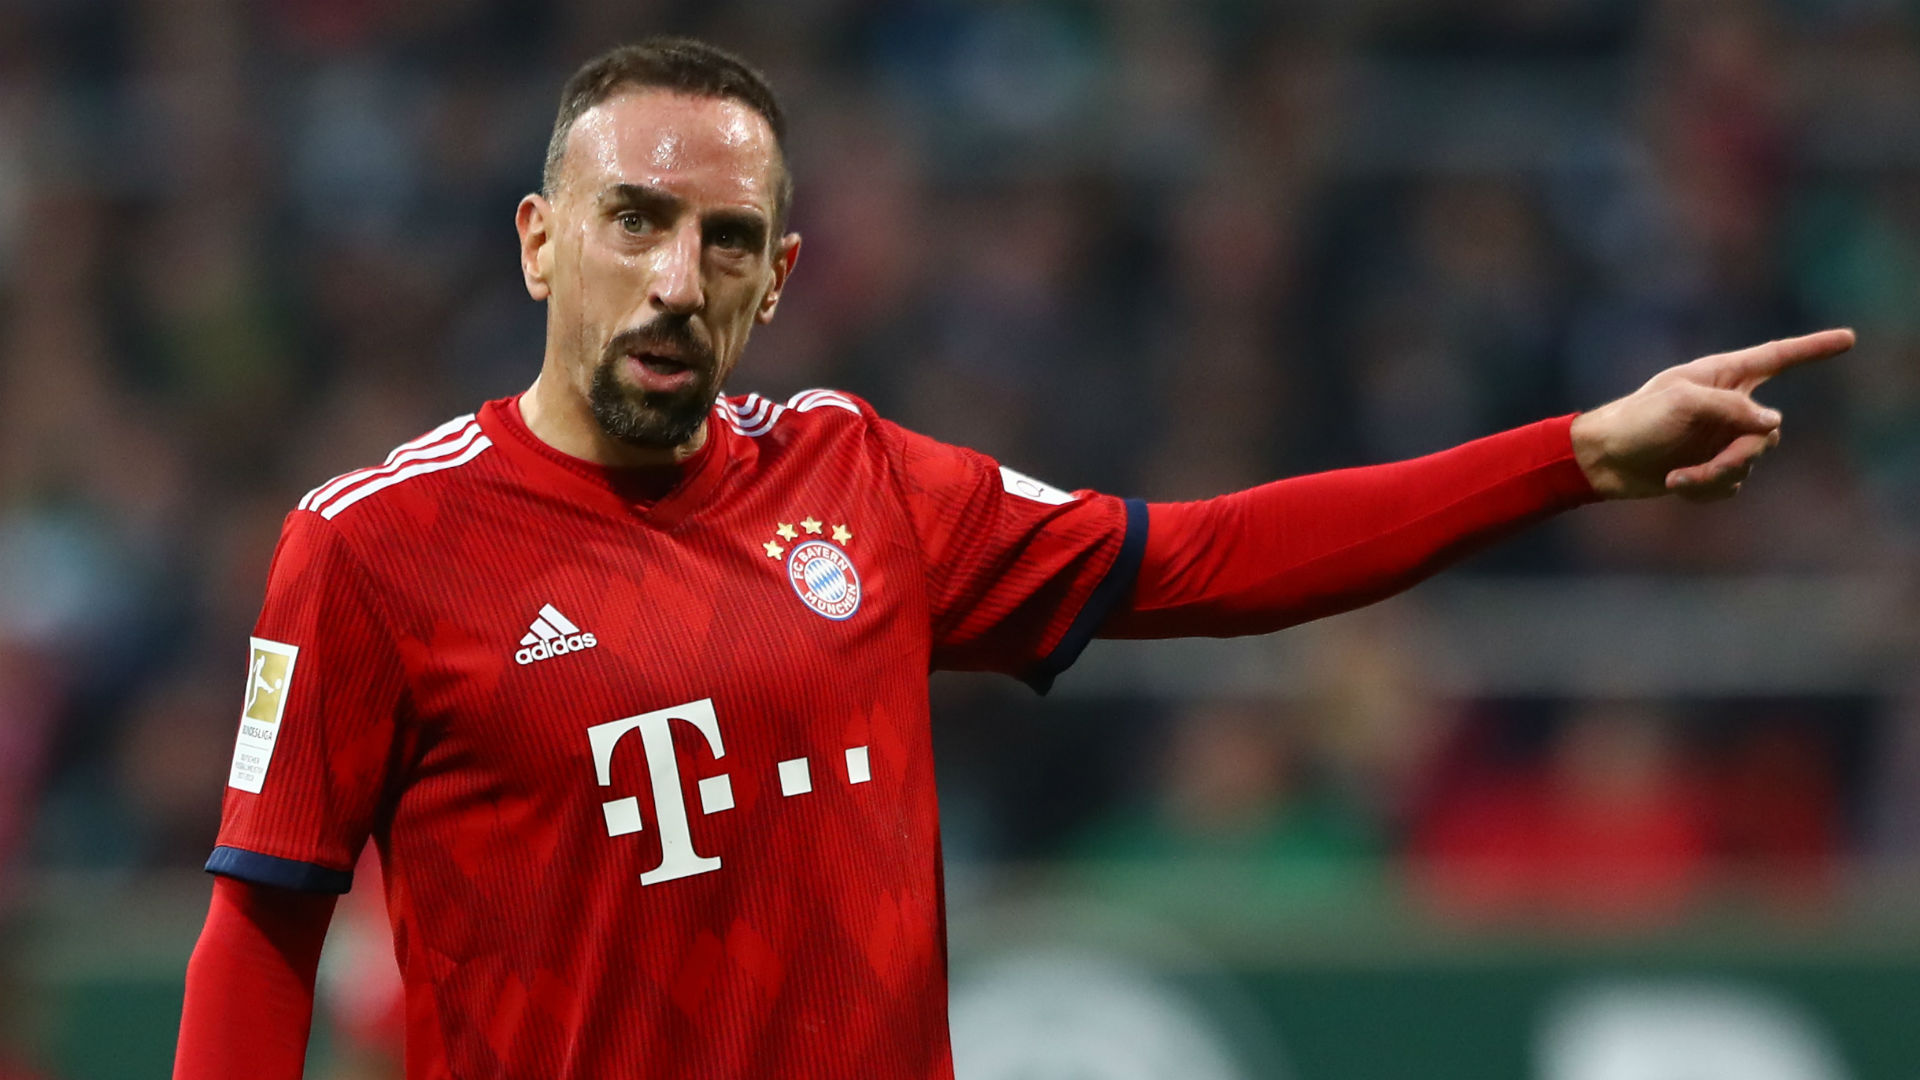 À 35 ans, Franck Ribéry veut durer au Bayern Munich | Goal.com